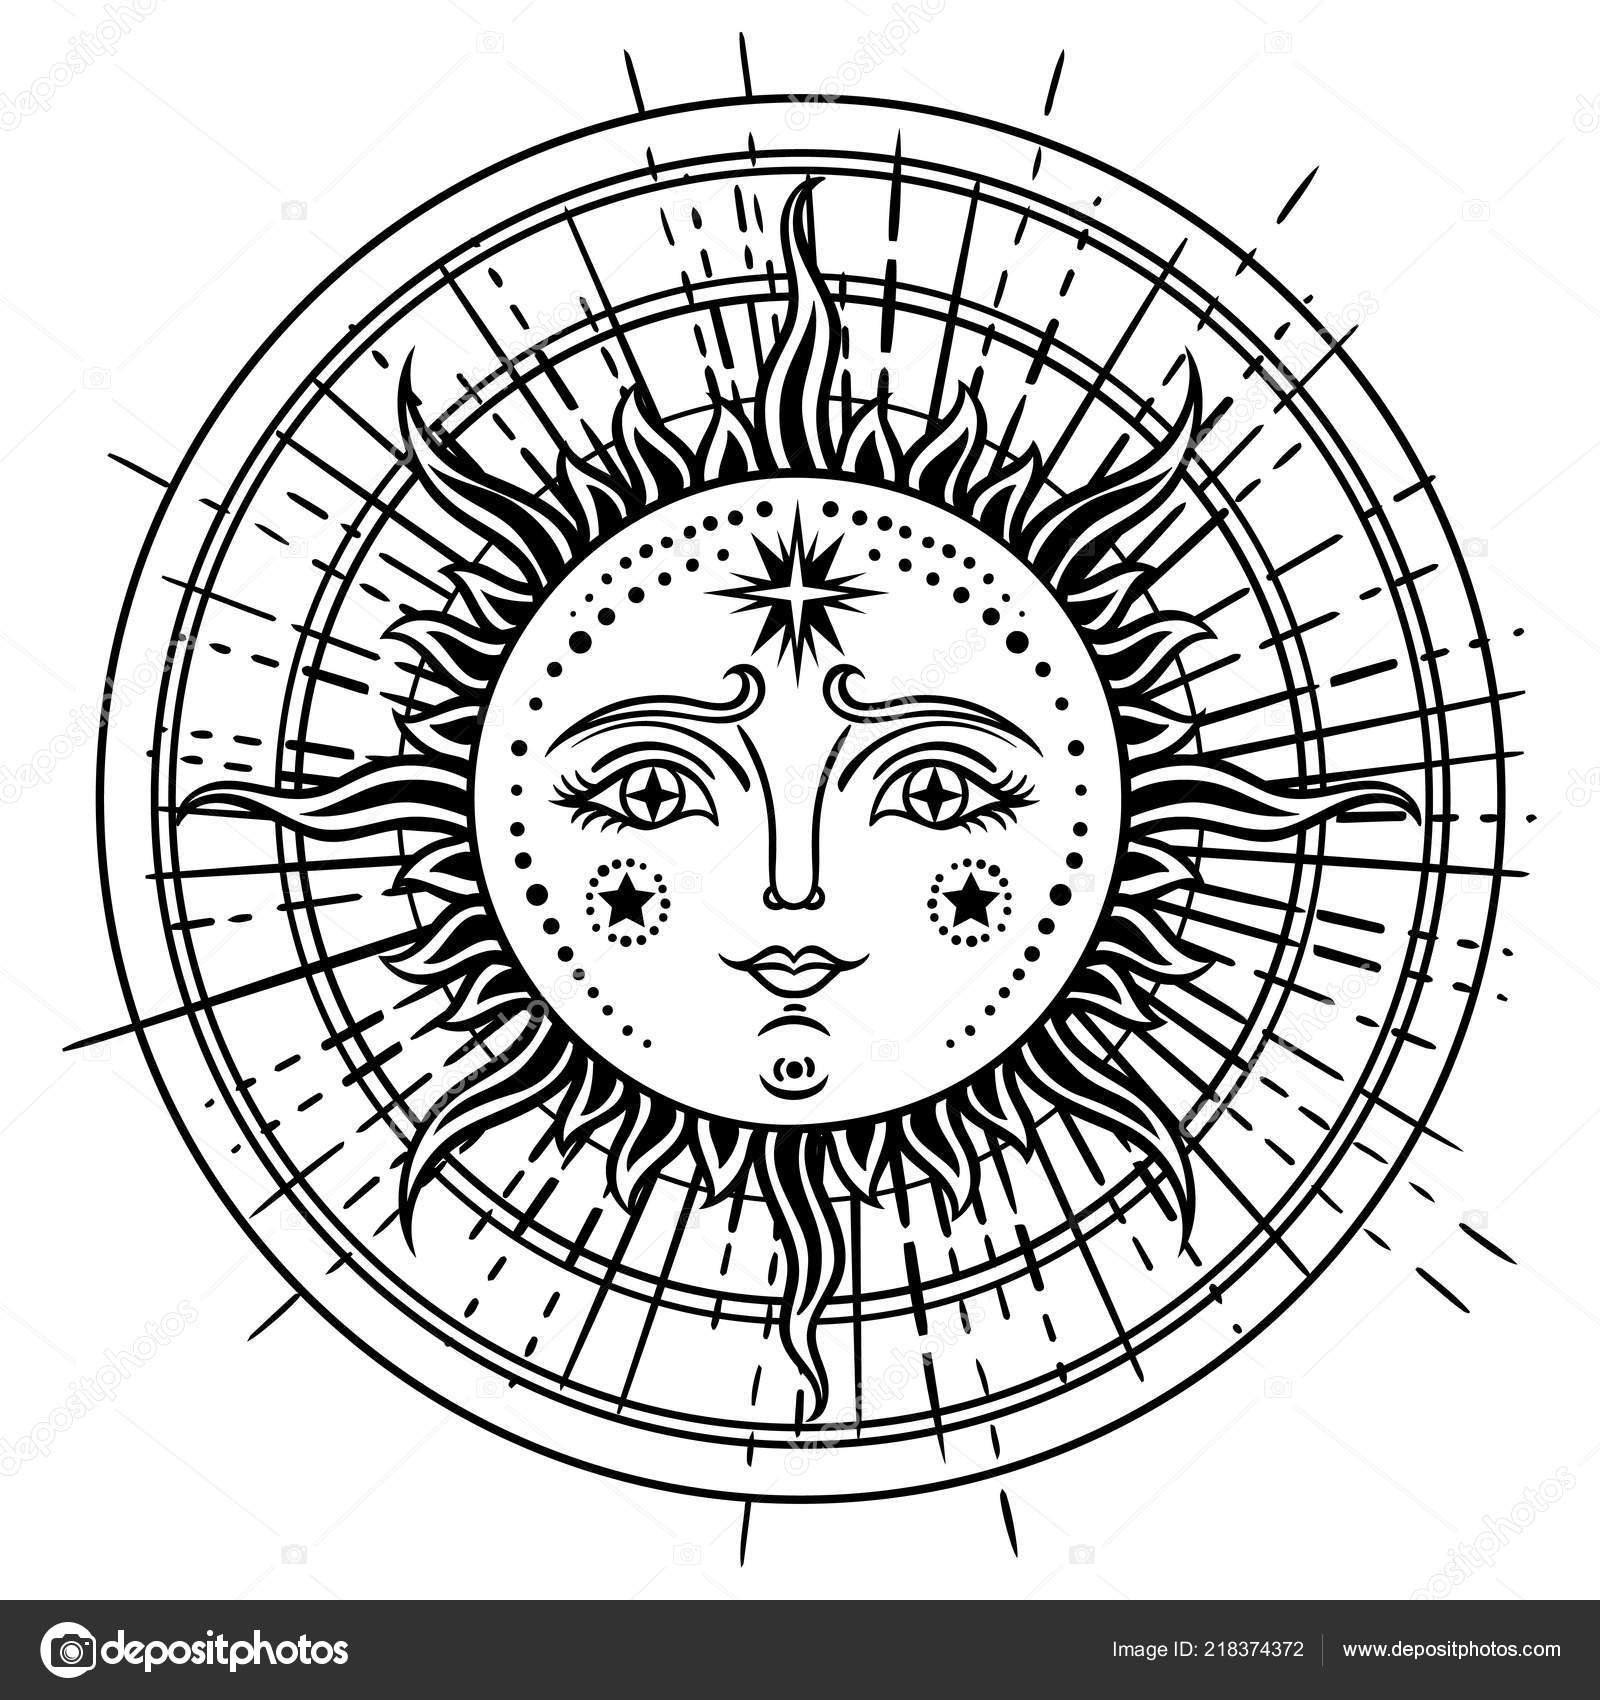 Vintage Main Dessinee Soleil Lune Visage Retro Illustration Soleil